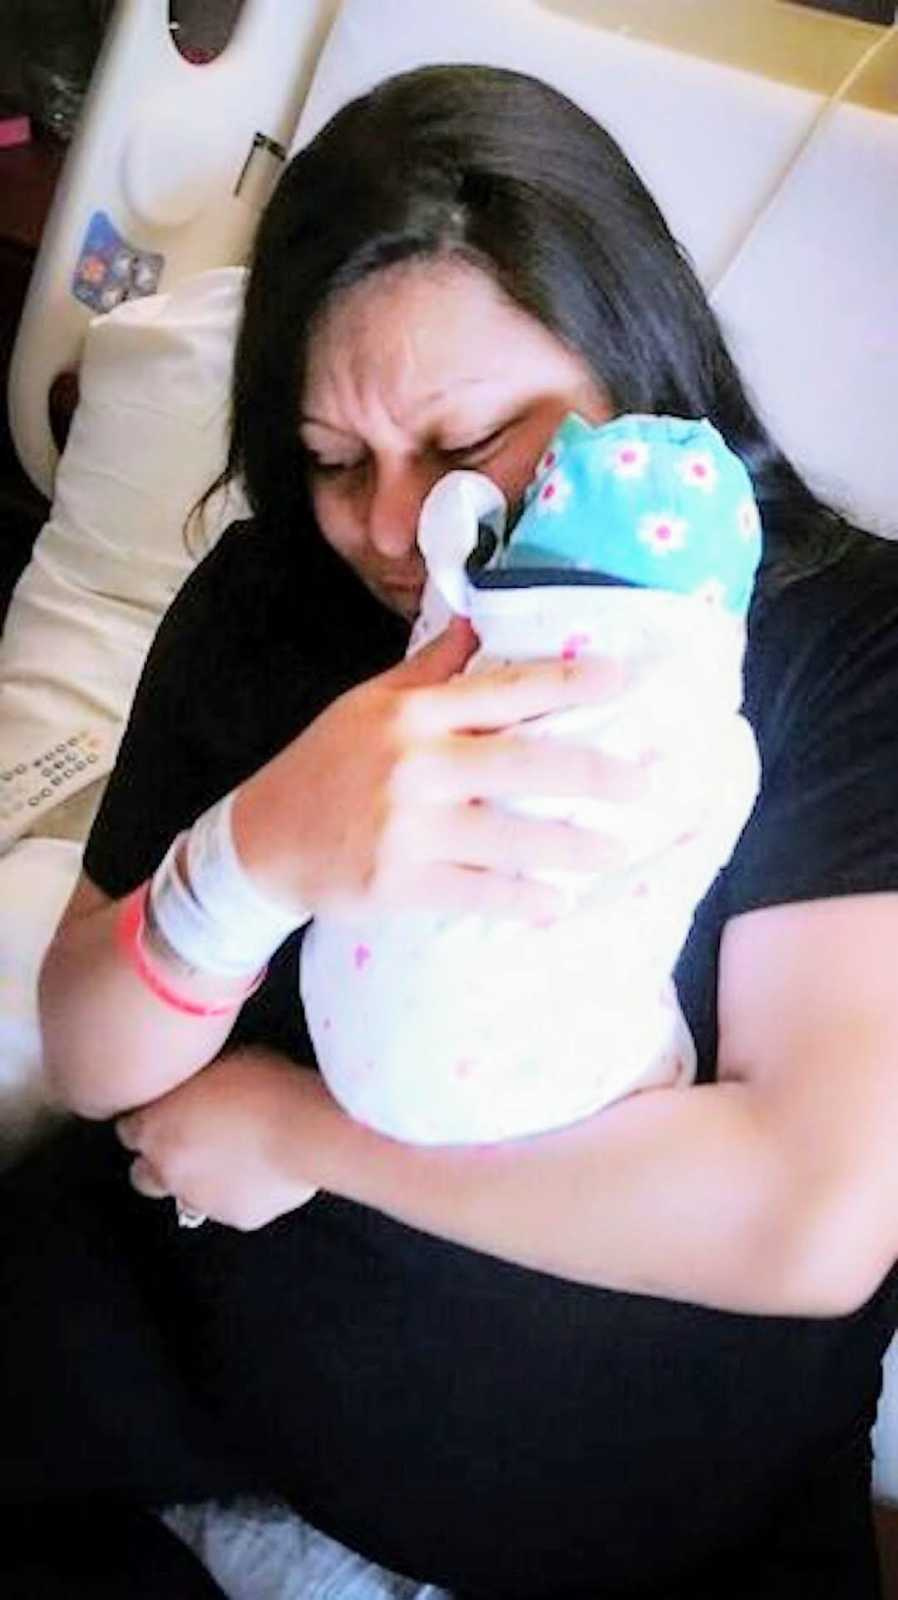 mom holding her newborn baby